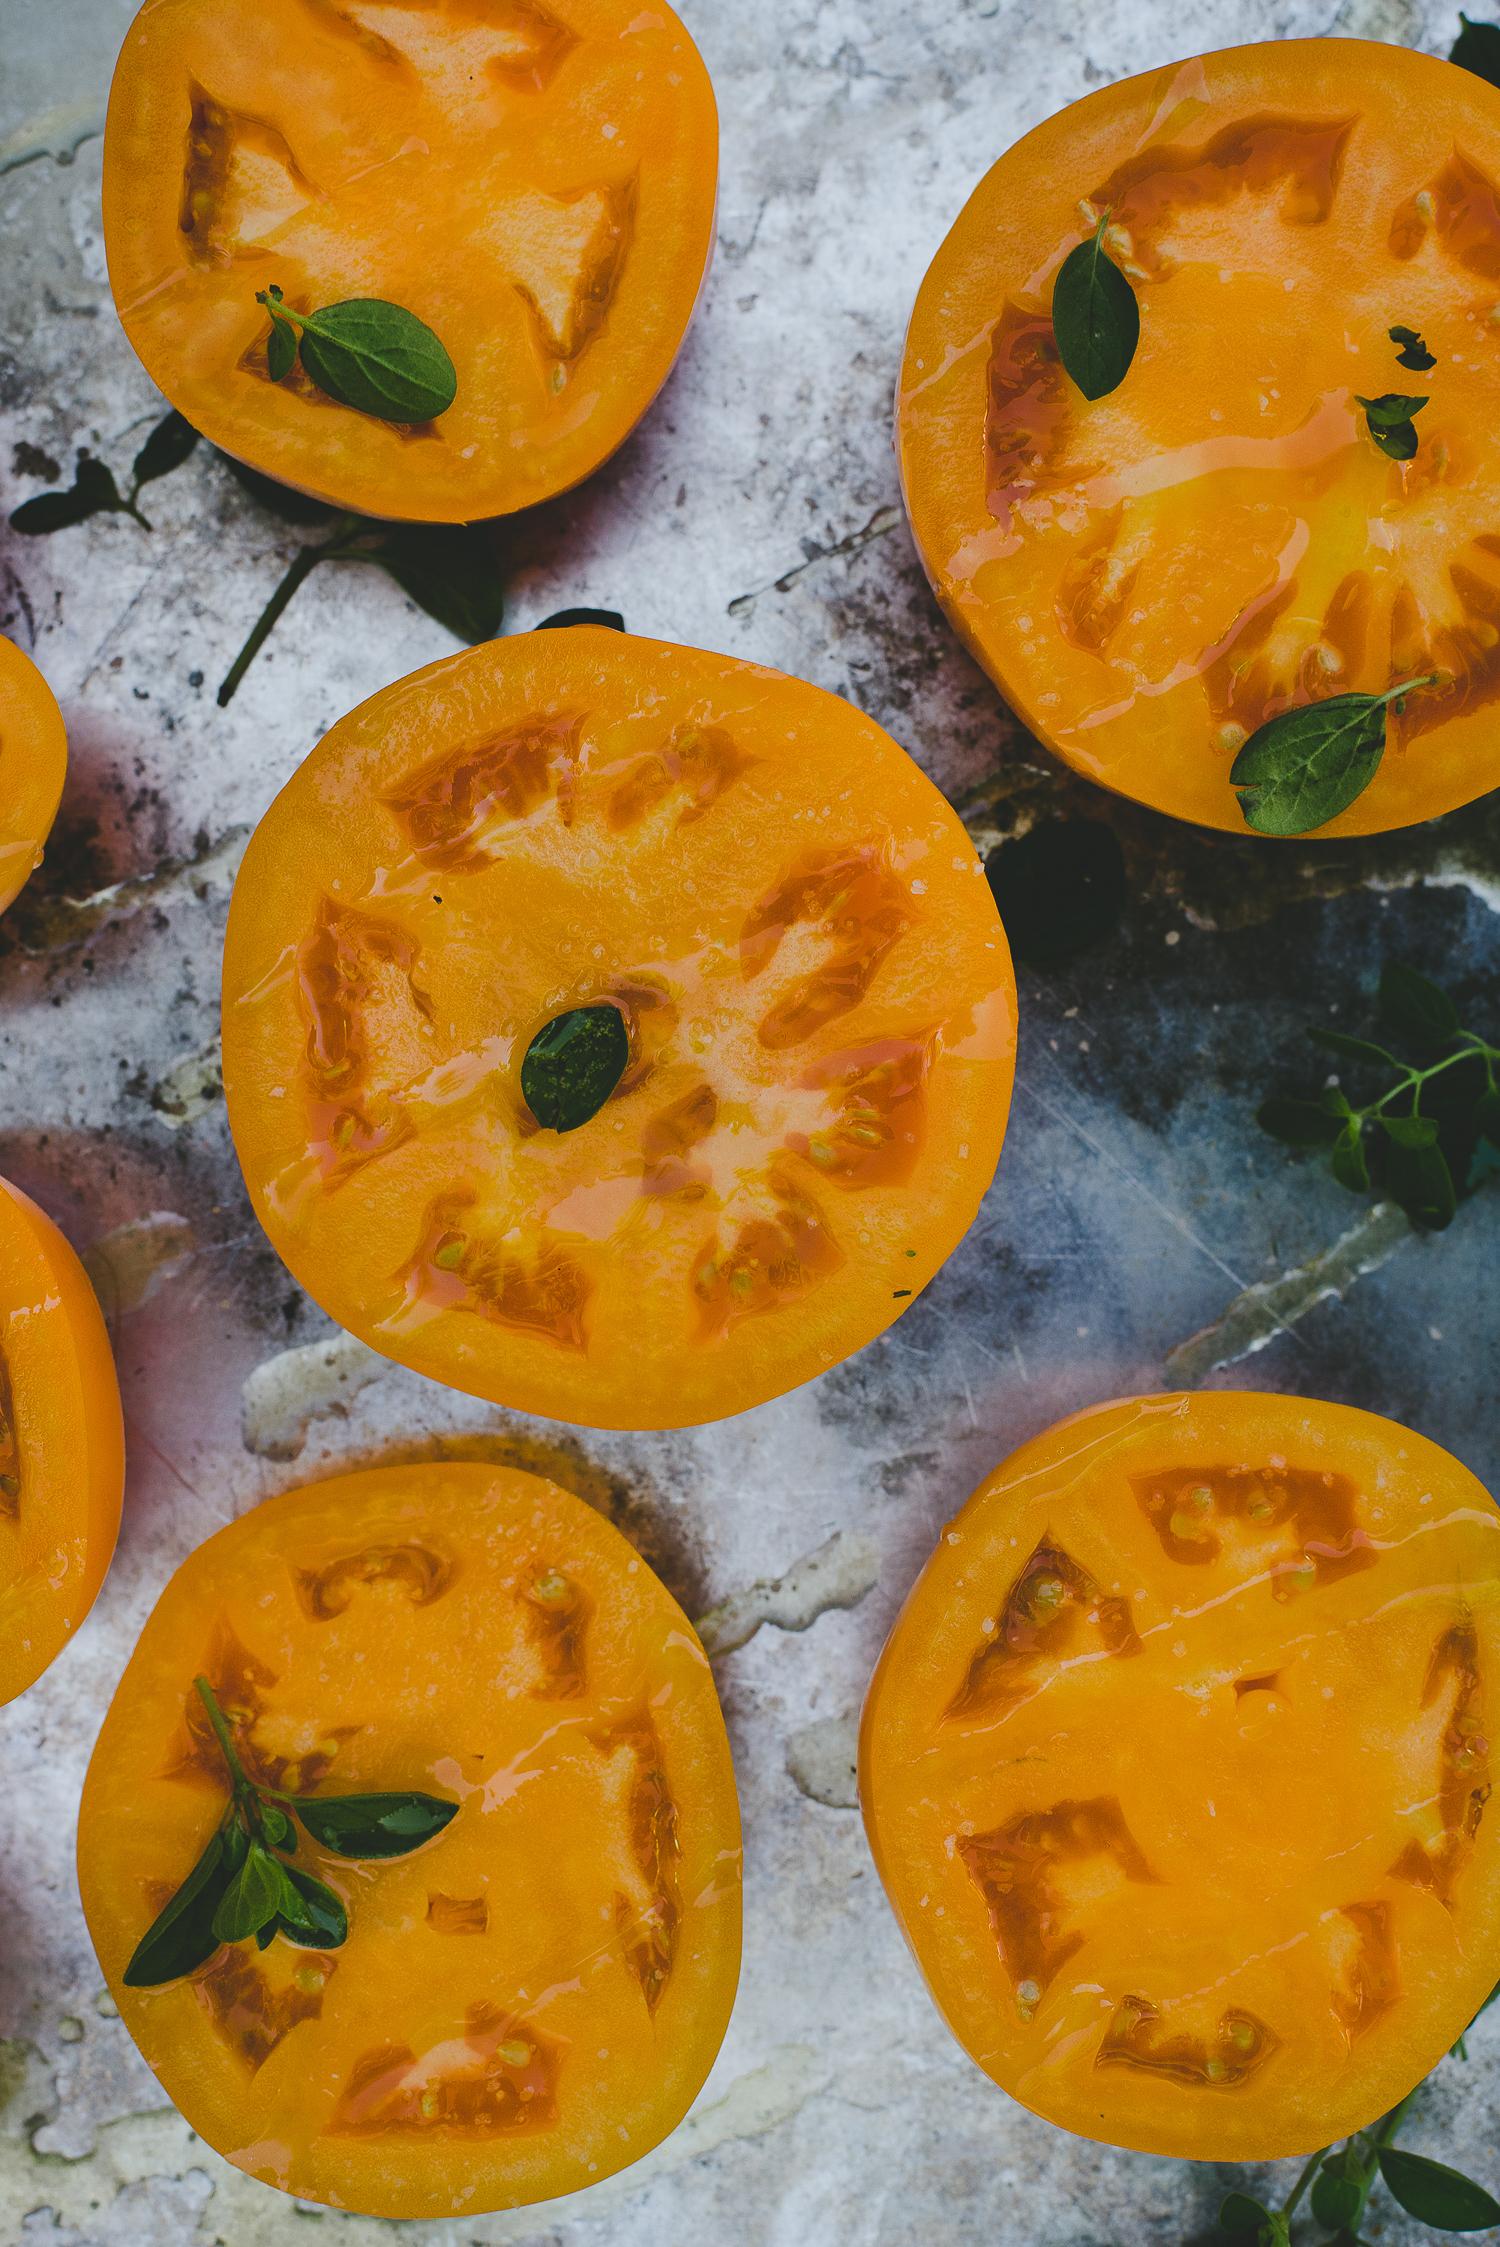 Muir_Glen_Tomatoes-37.jpg